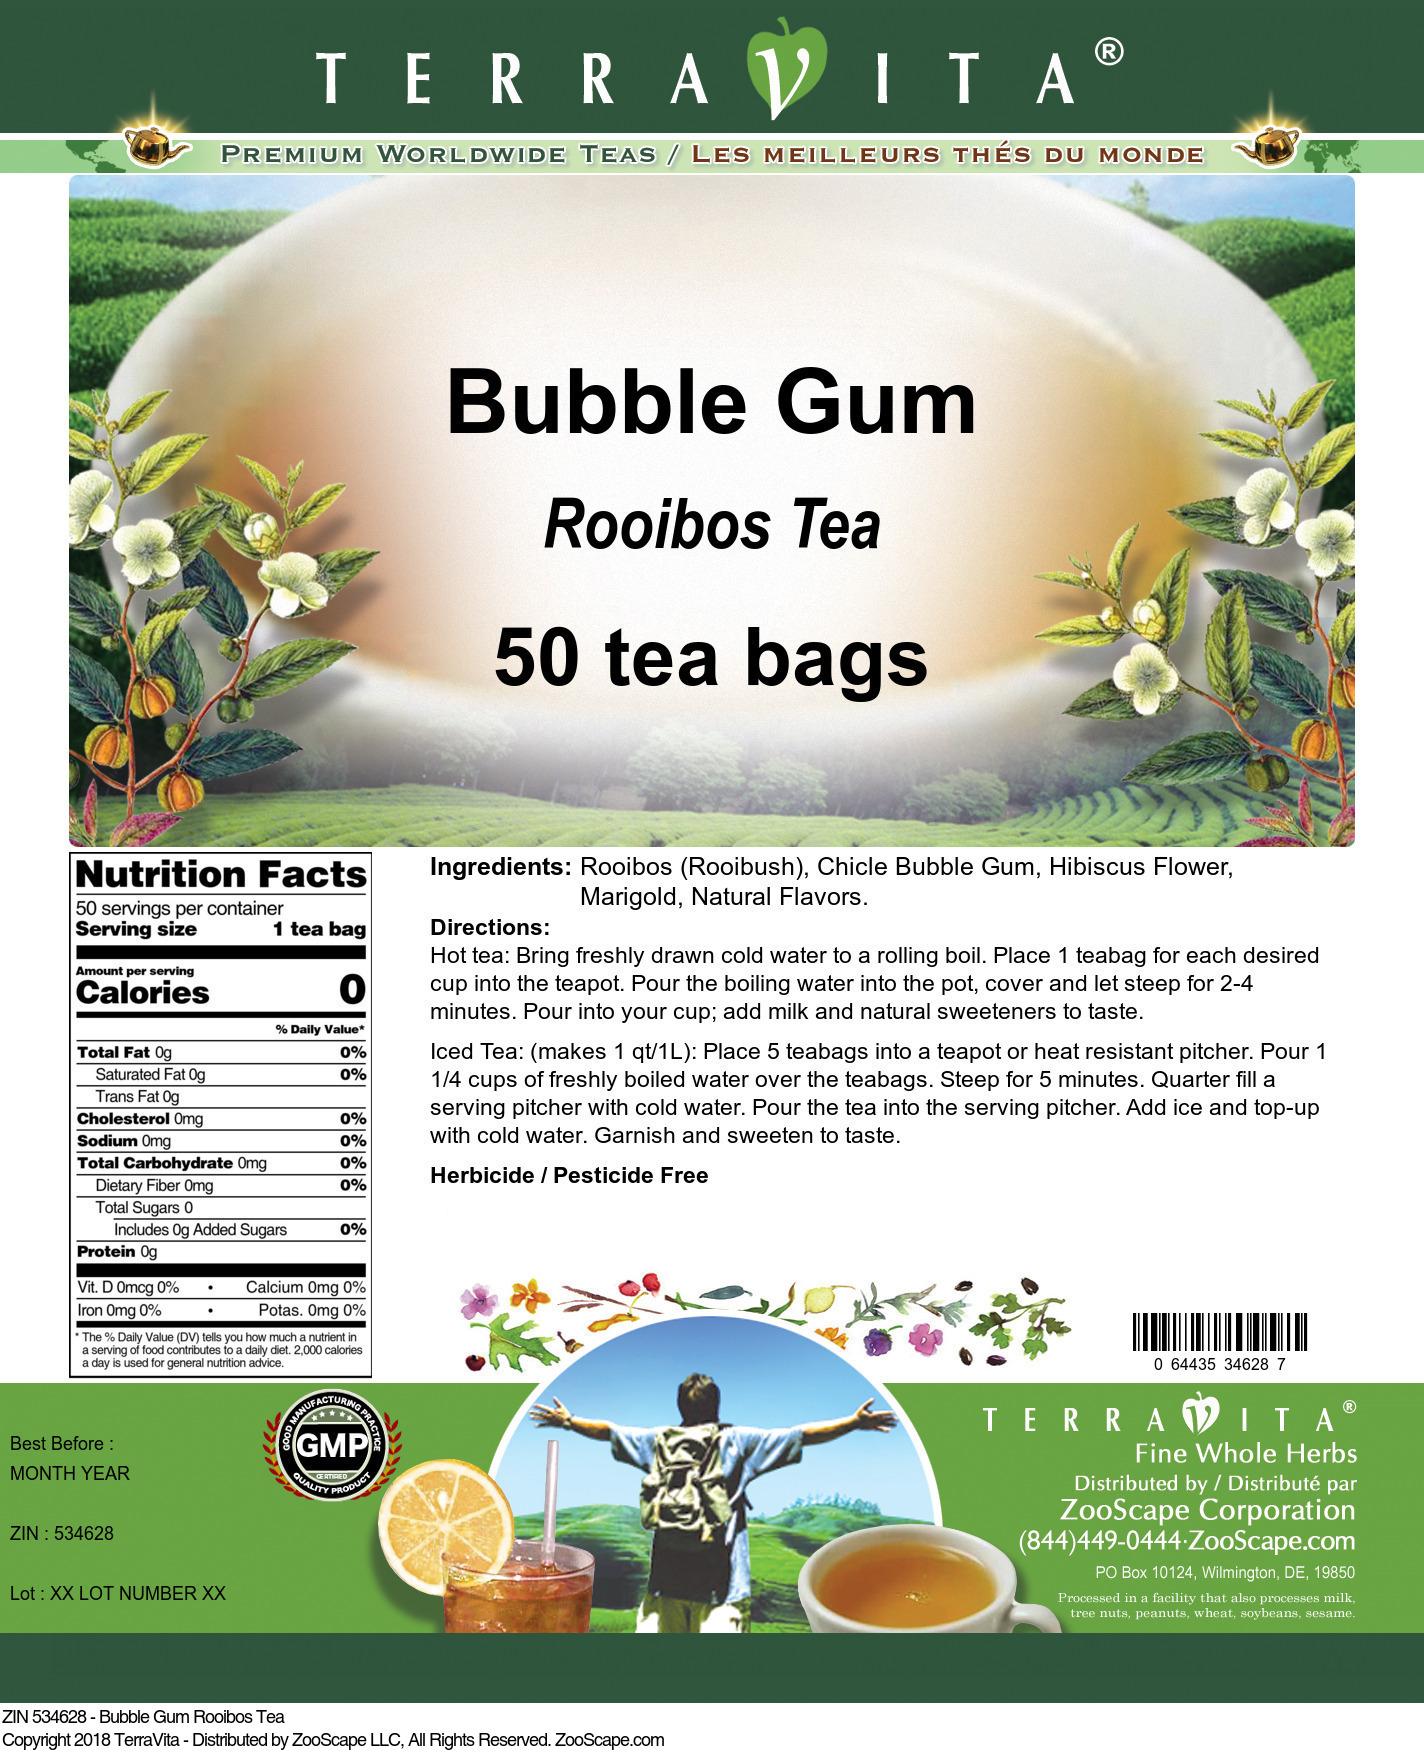 Bubble Gum Rooibos Tea